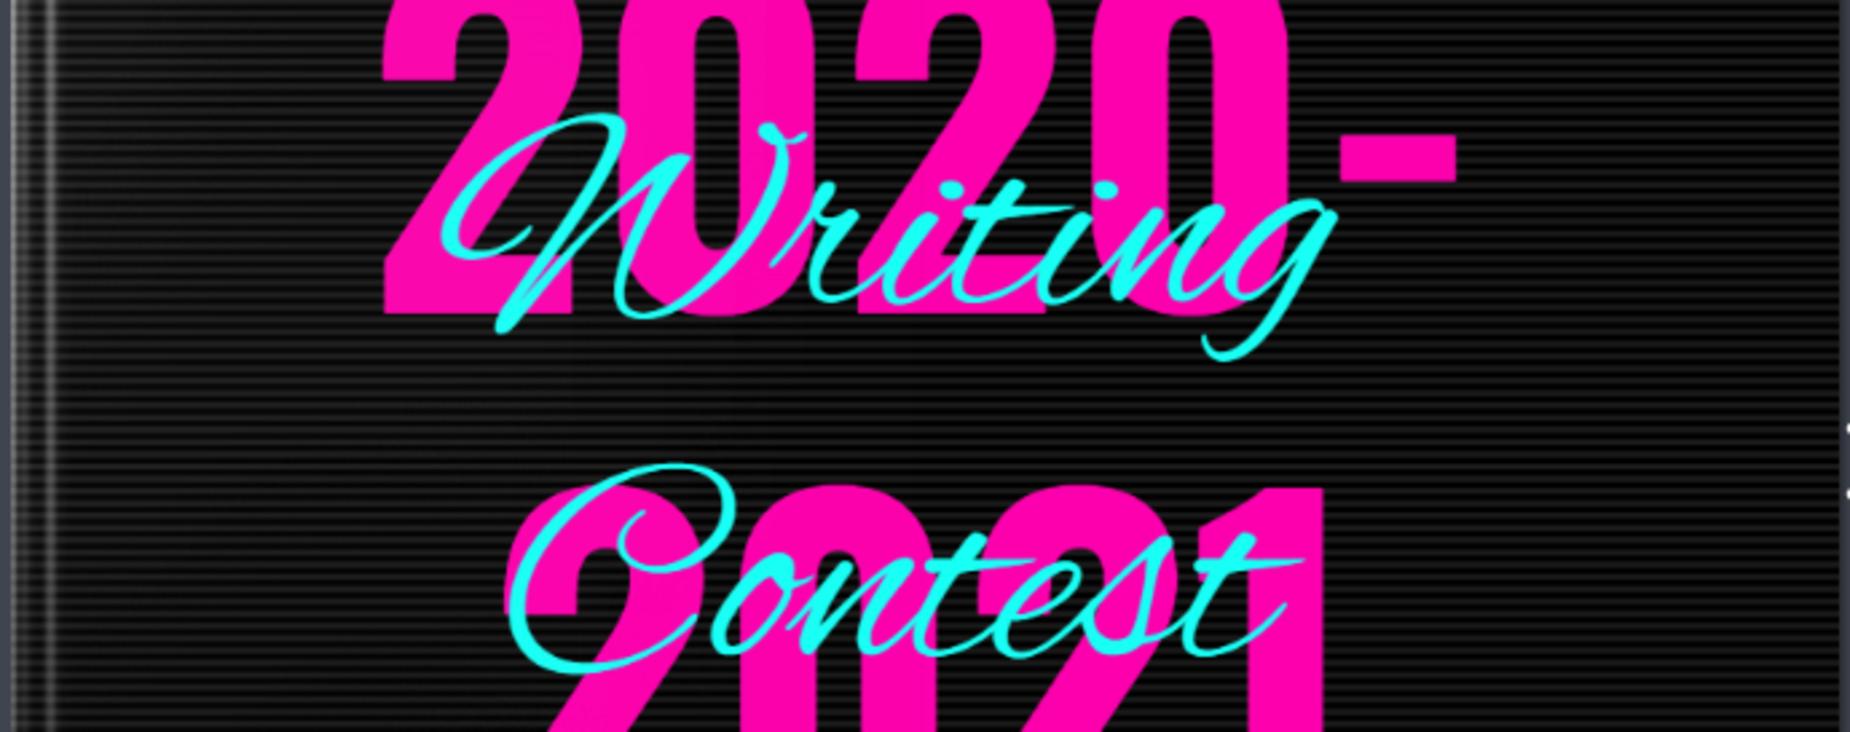 2020-2021 Writing Contest Digital book